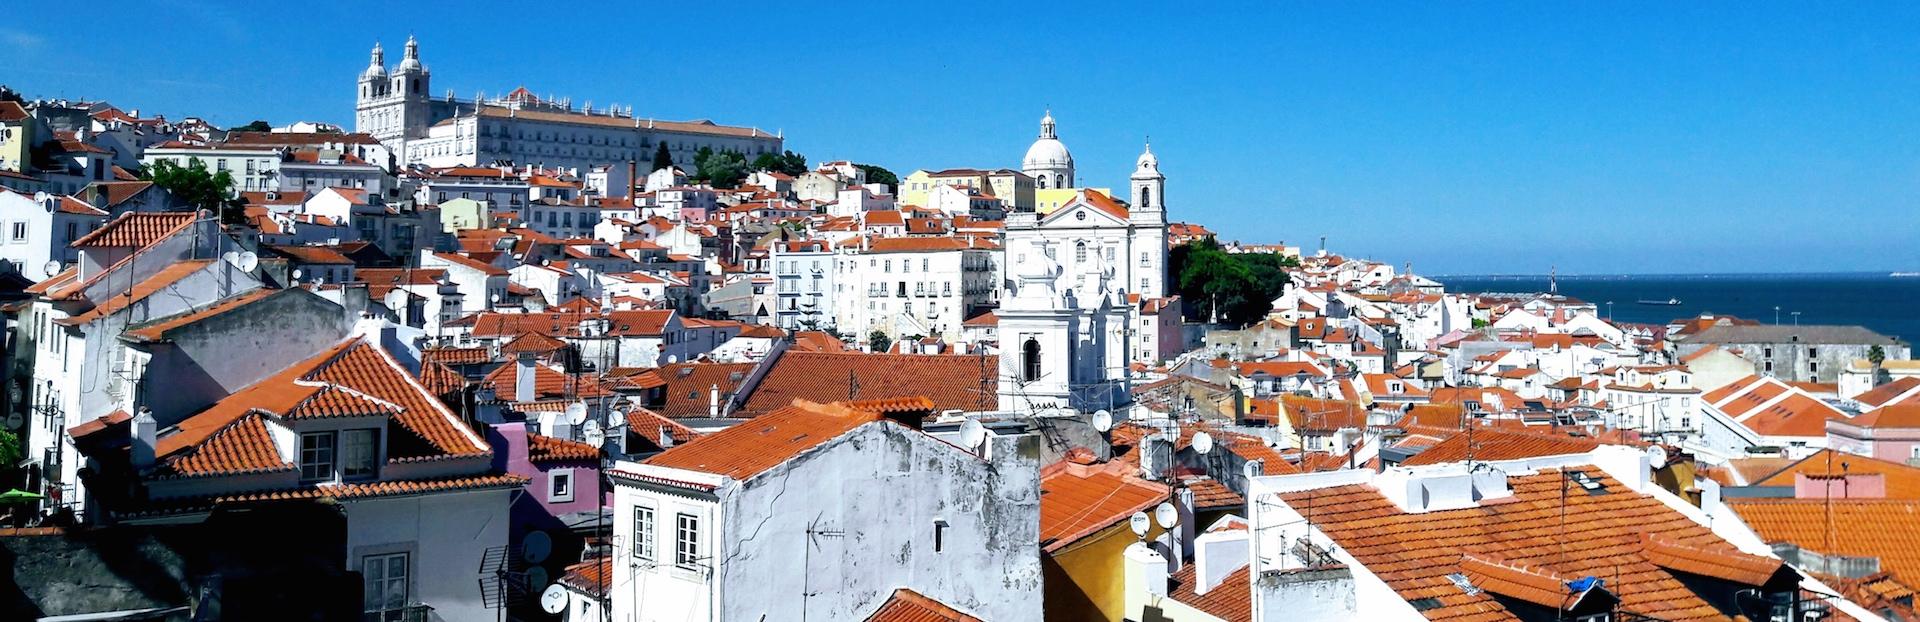 Alfama - the original Moorish district of Lisbon 22